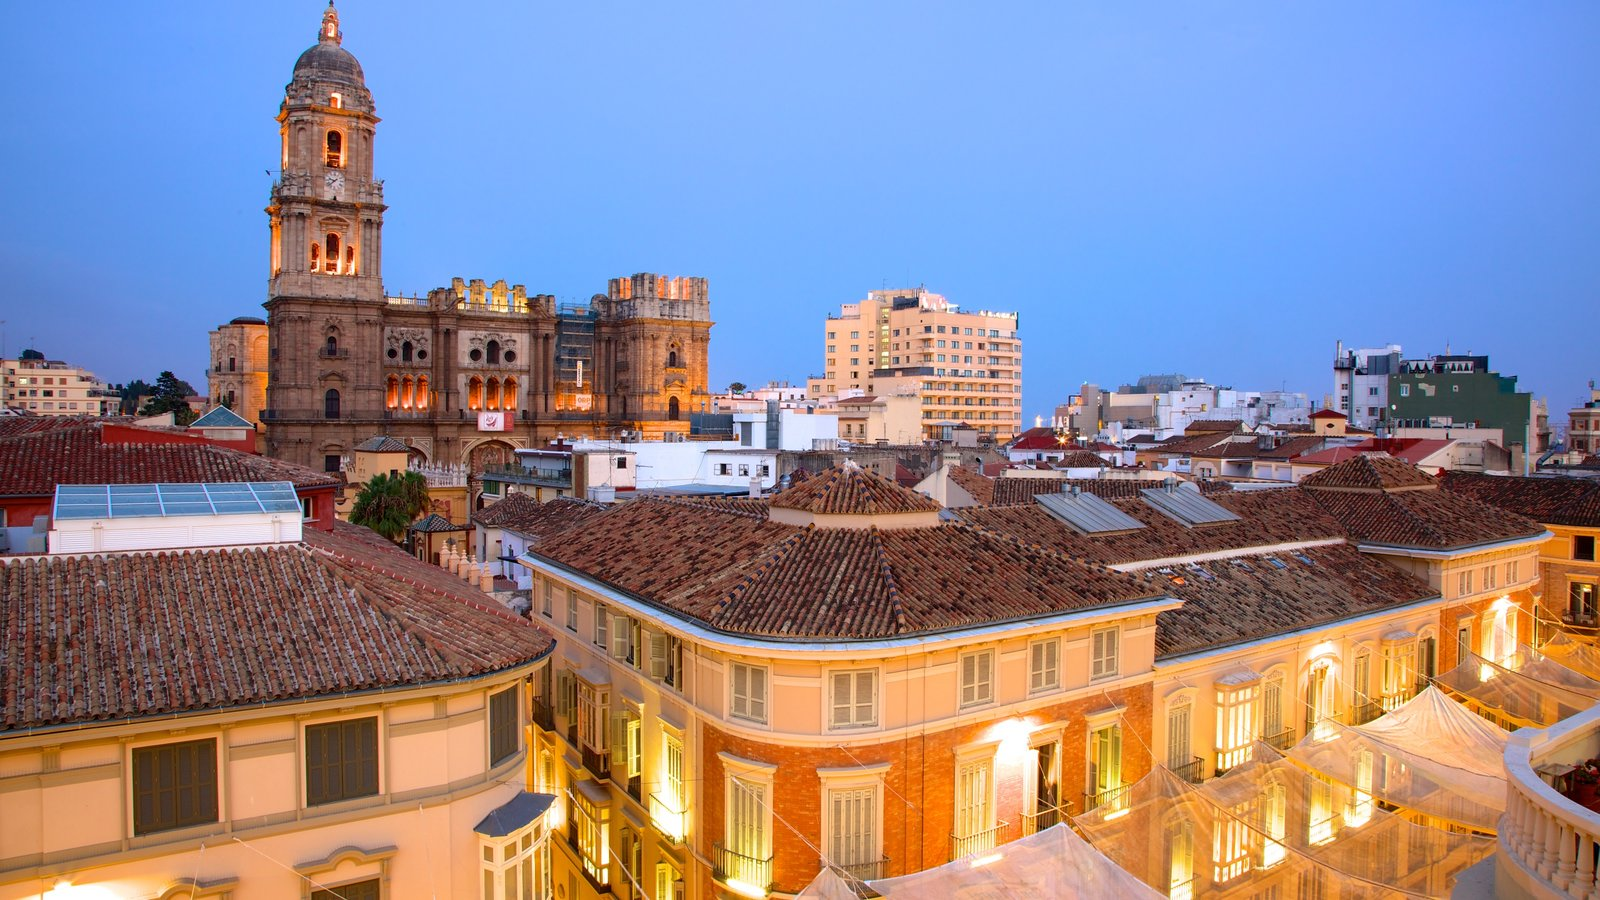 Malaga Historic Centre featuring heritage architecture, art and night scenes